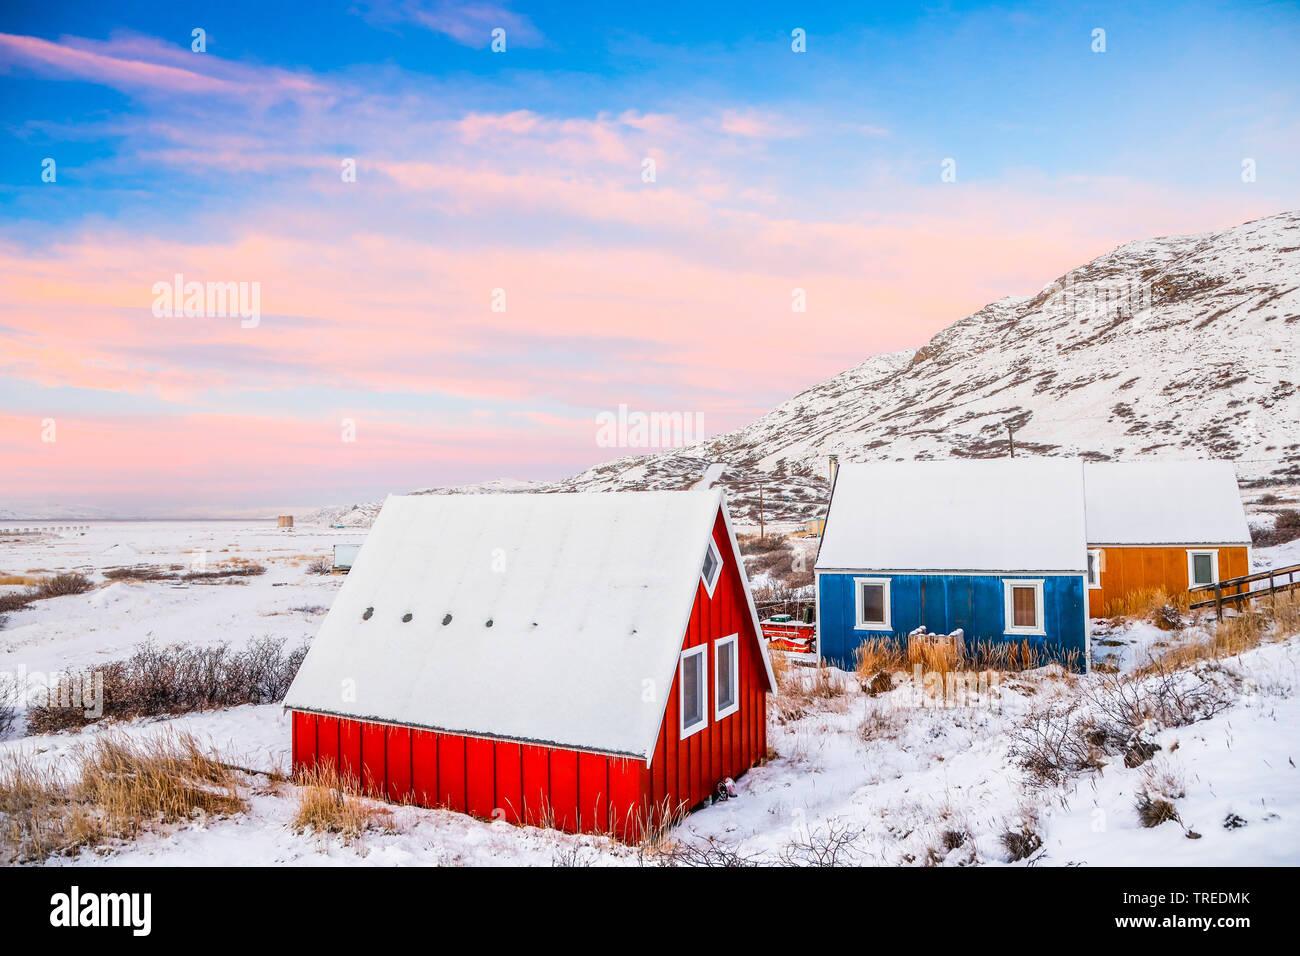 bunte Holzhaeuser im Schnee, Groenland   colorful frame houses in snow, Greenland   BLWS523774.jpg [ (c) blickwinkel/AGAMI/C. van Rijswijk Tel. +49 (0 - Stock Image